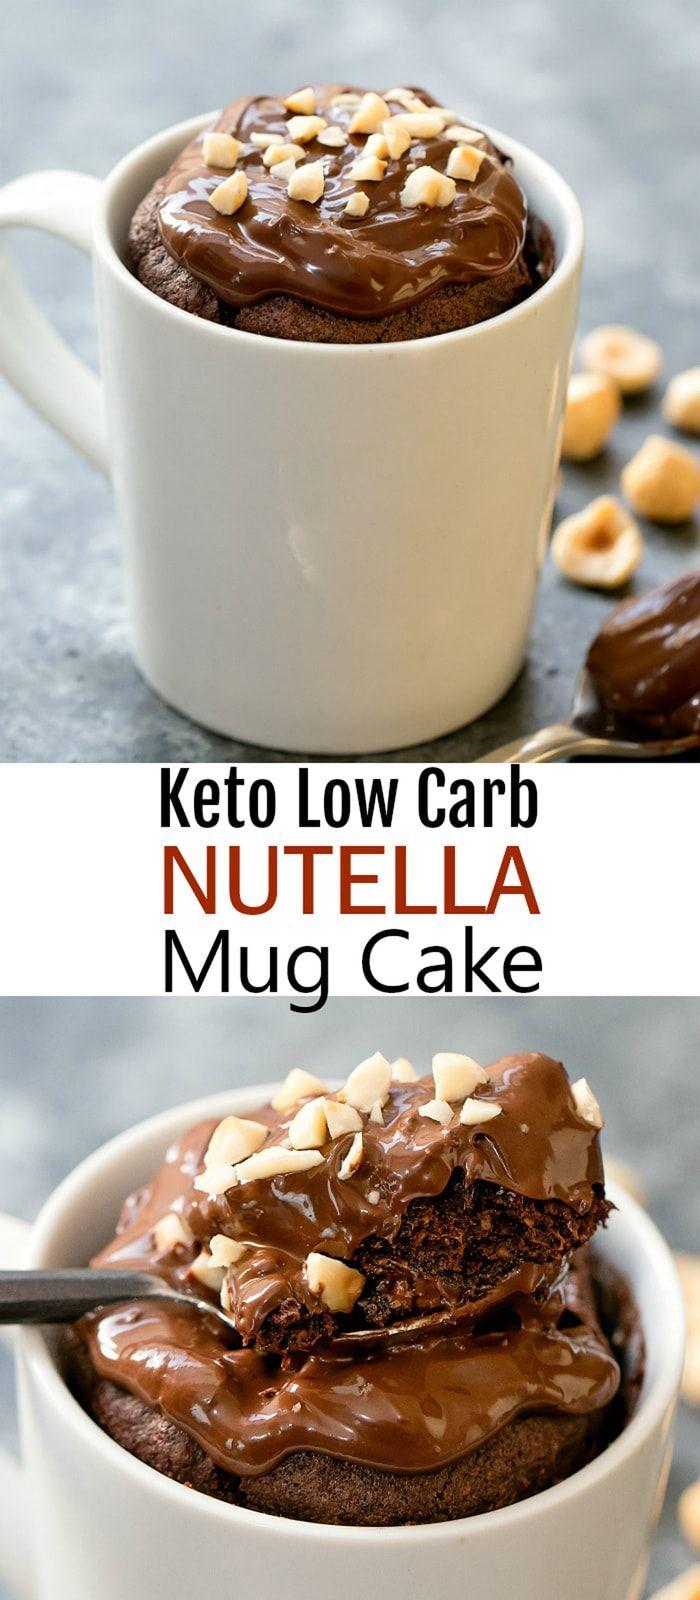 Keto Nutella Mug Cake | Recipe | Nutella mug cake, Mug ...